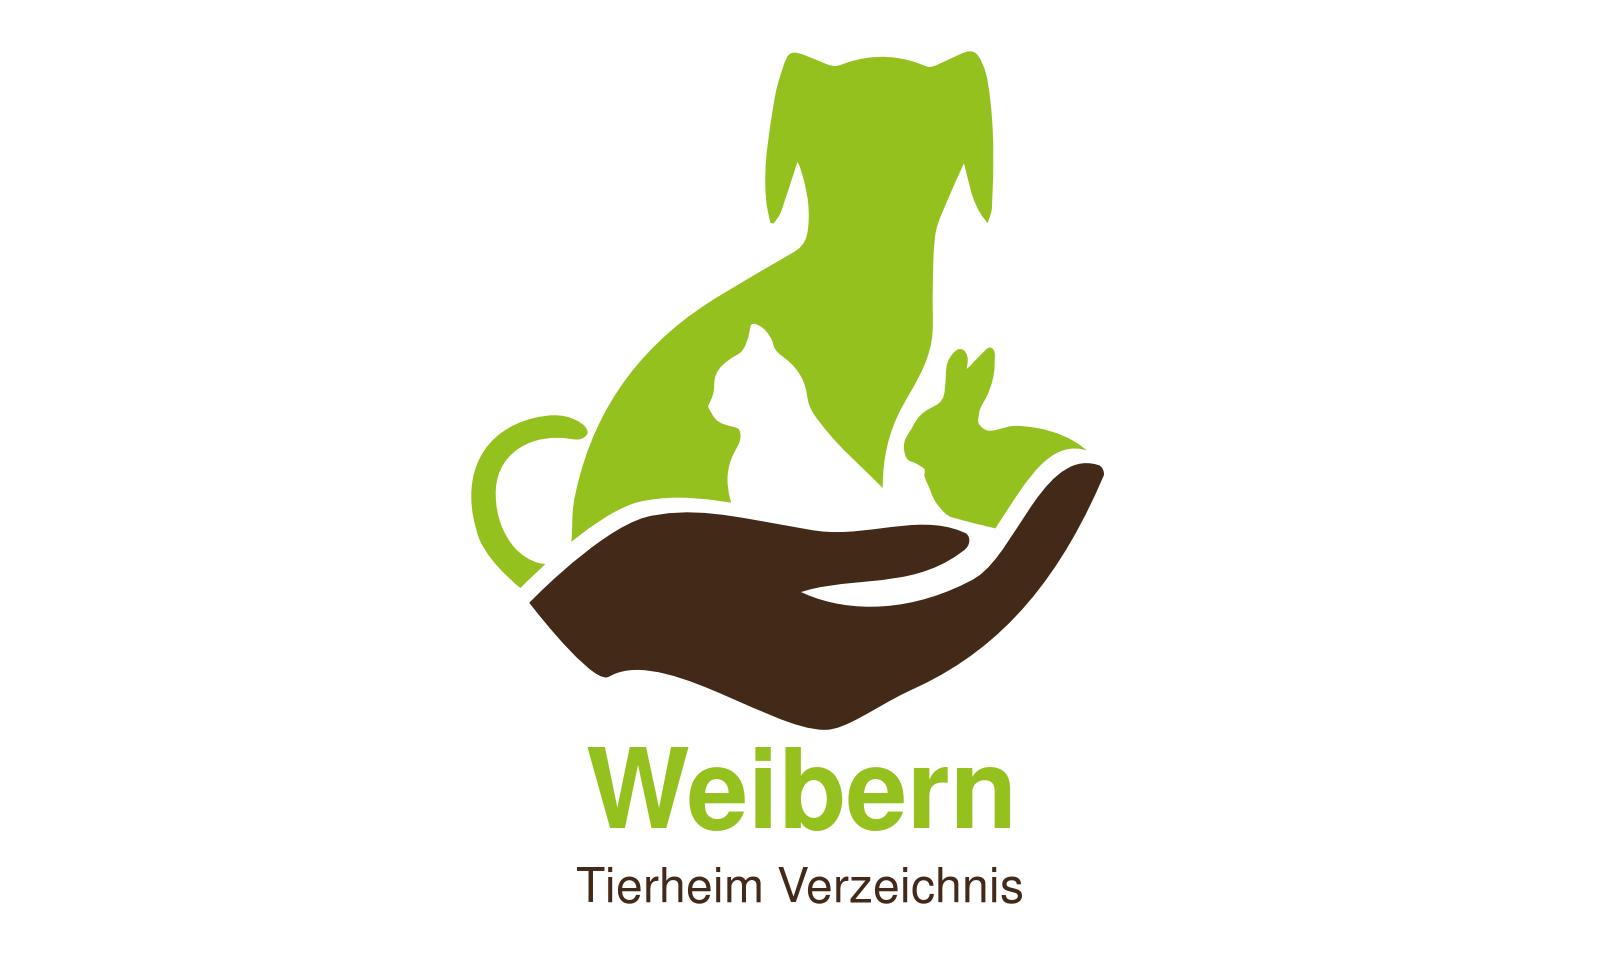 Tierheim Weibern